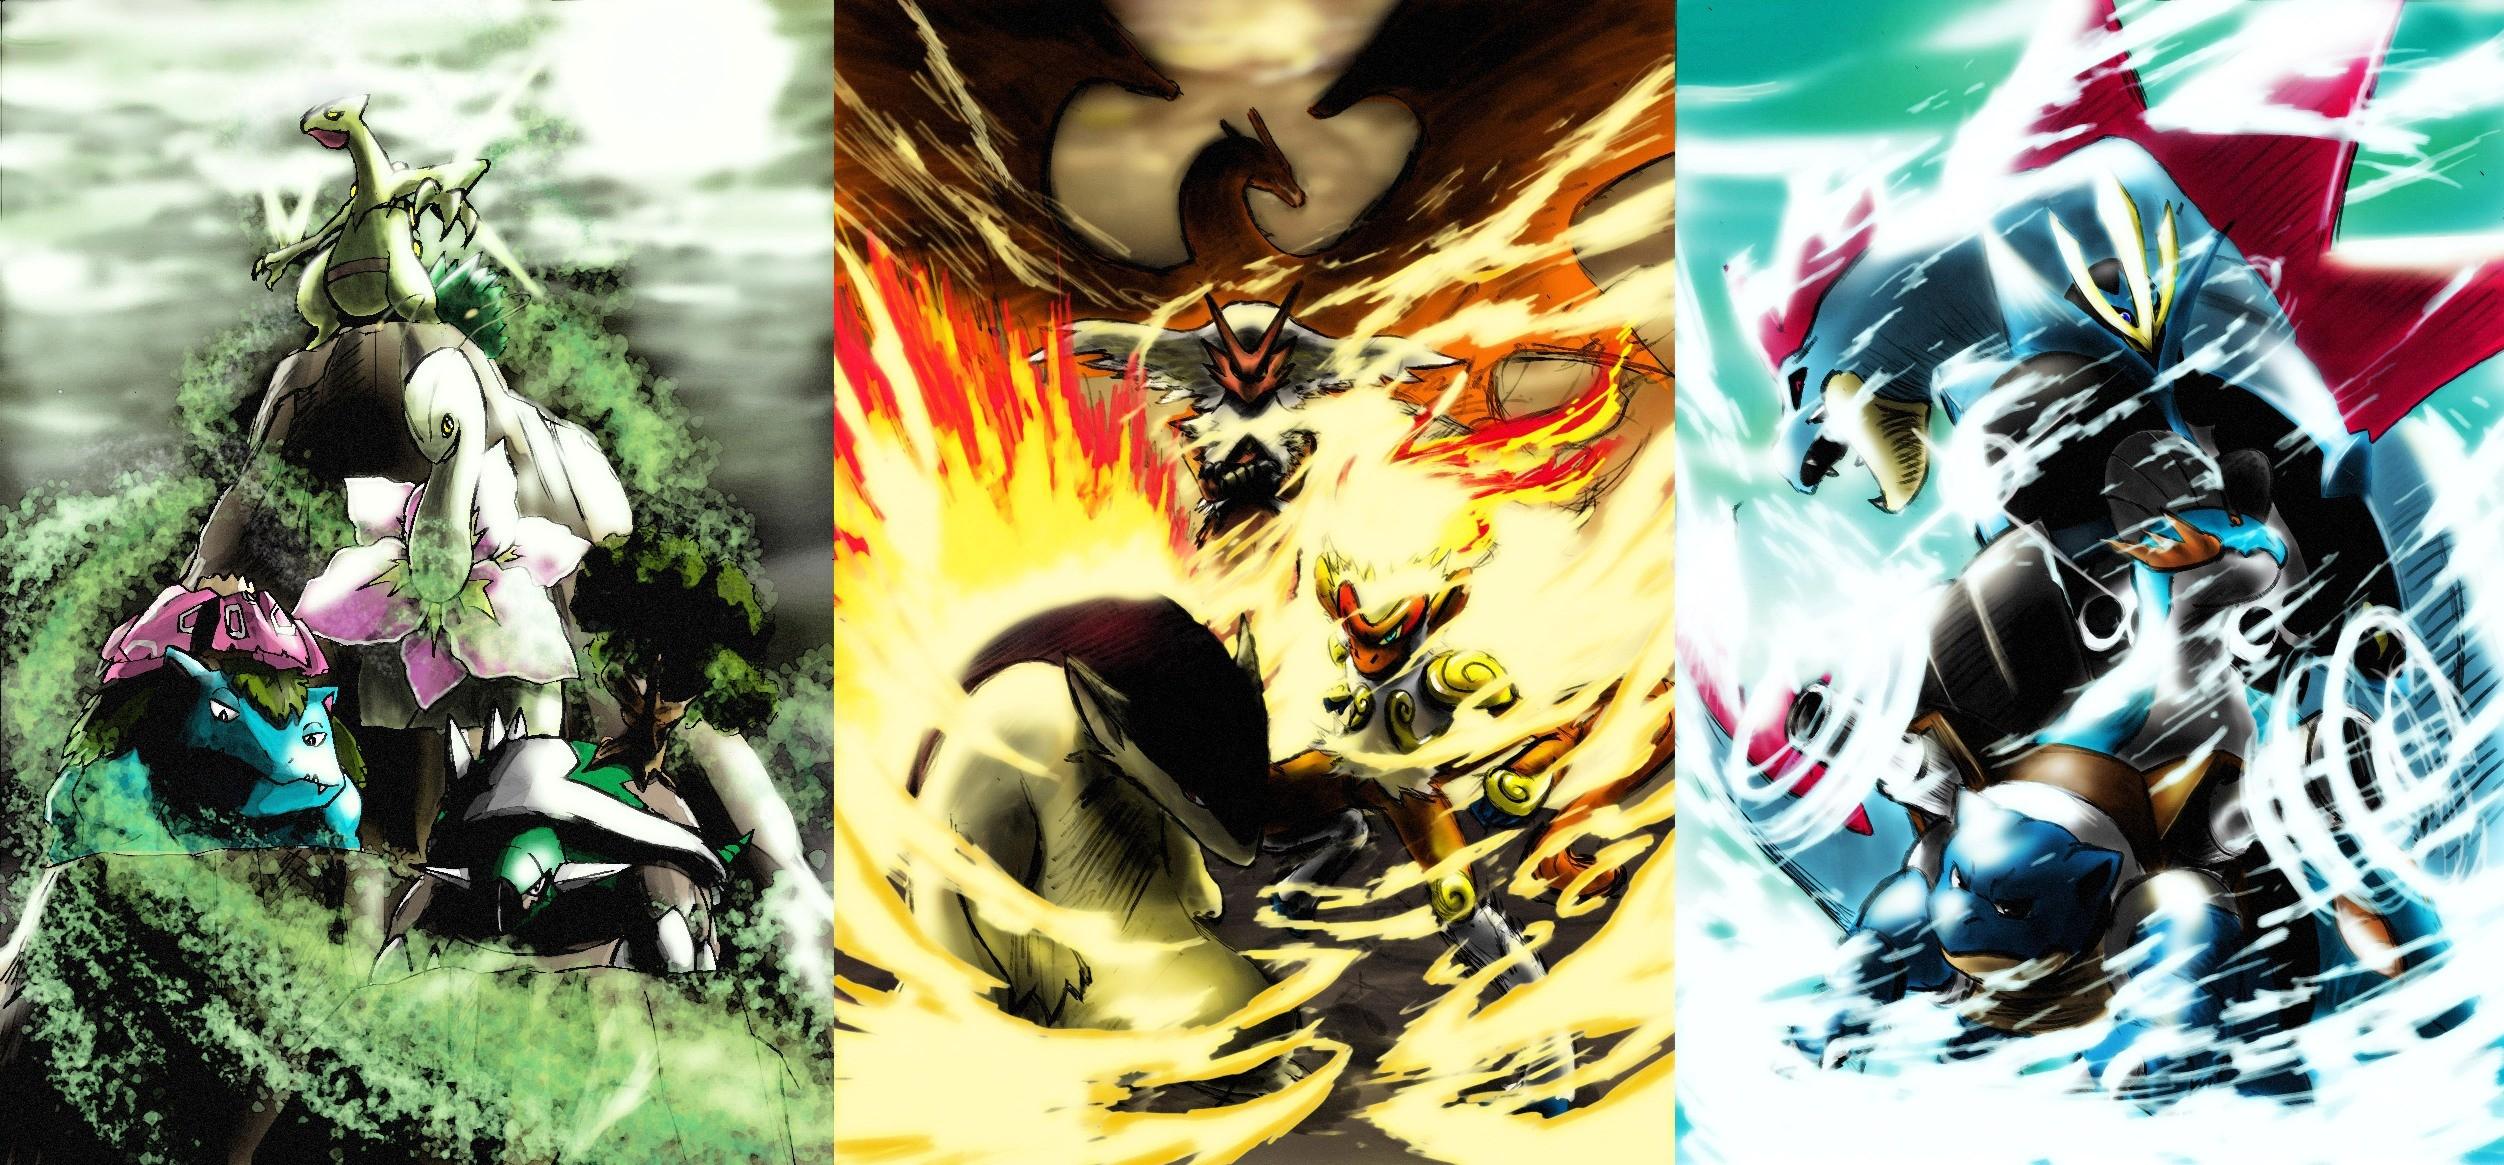 HD Wallpaper | Background ID:119279. Anime Pokémon